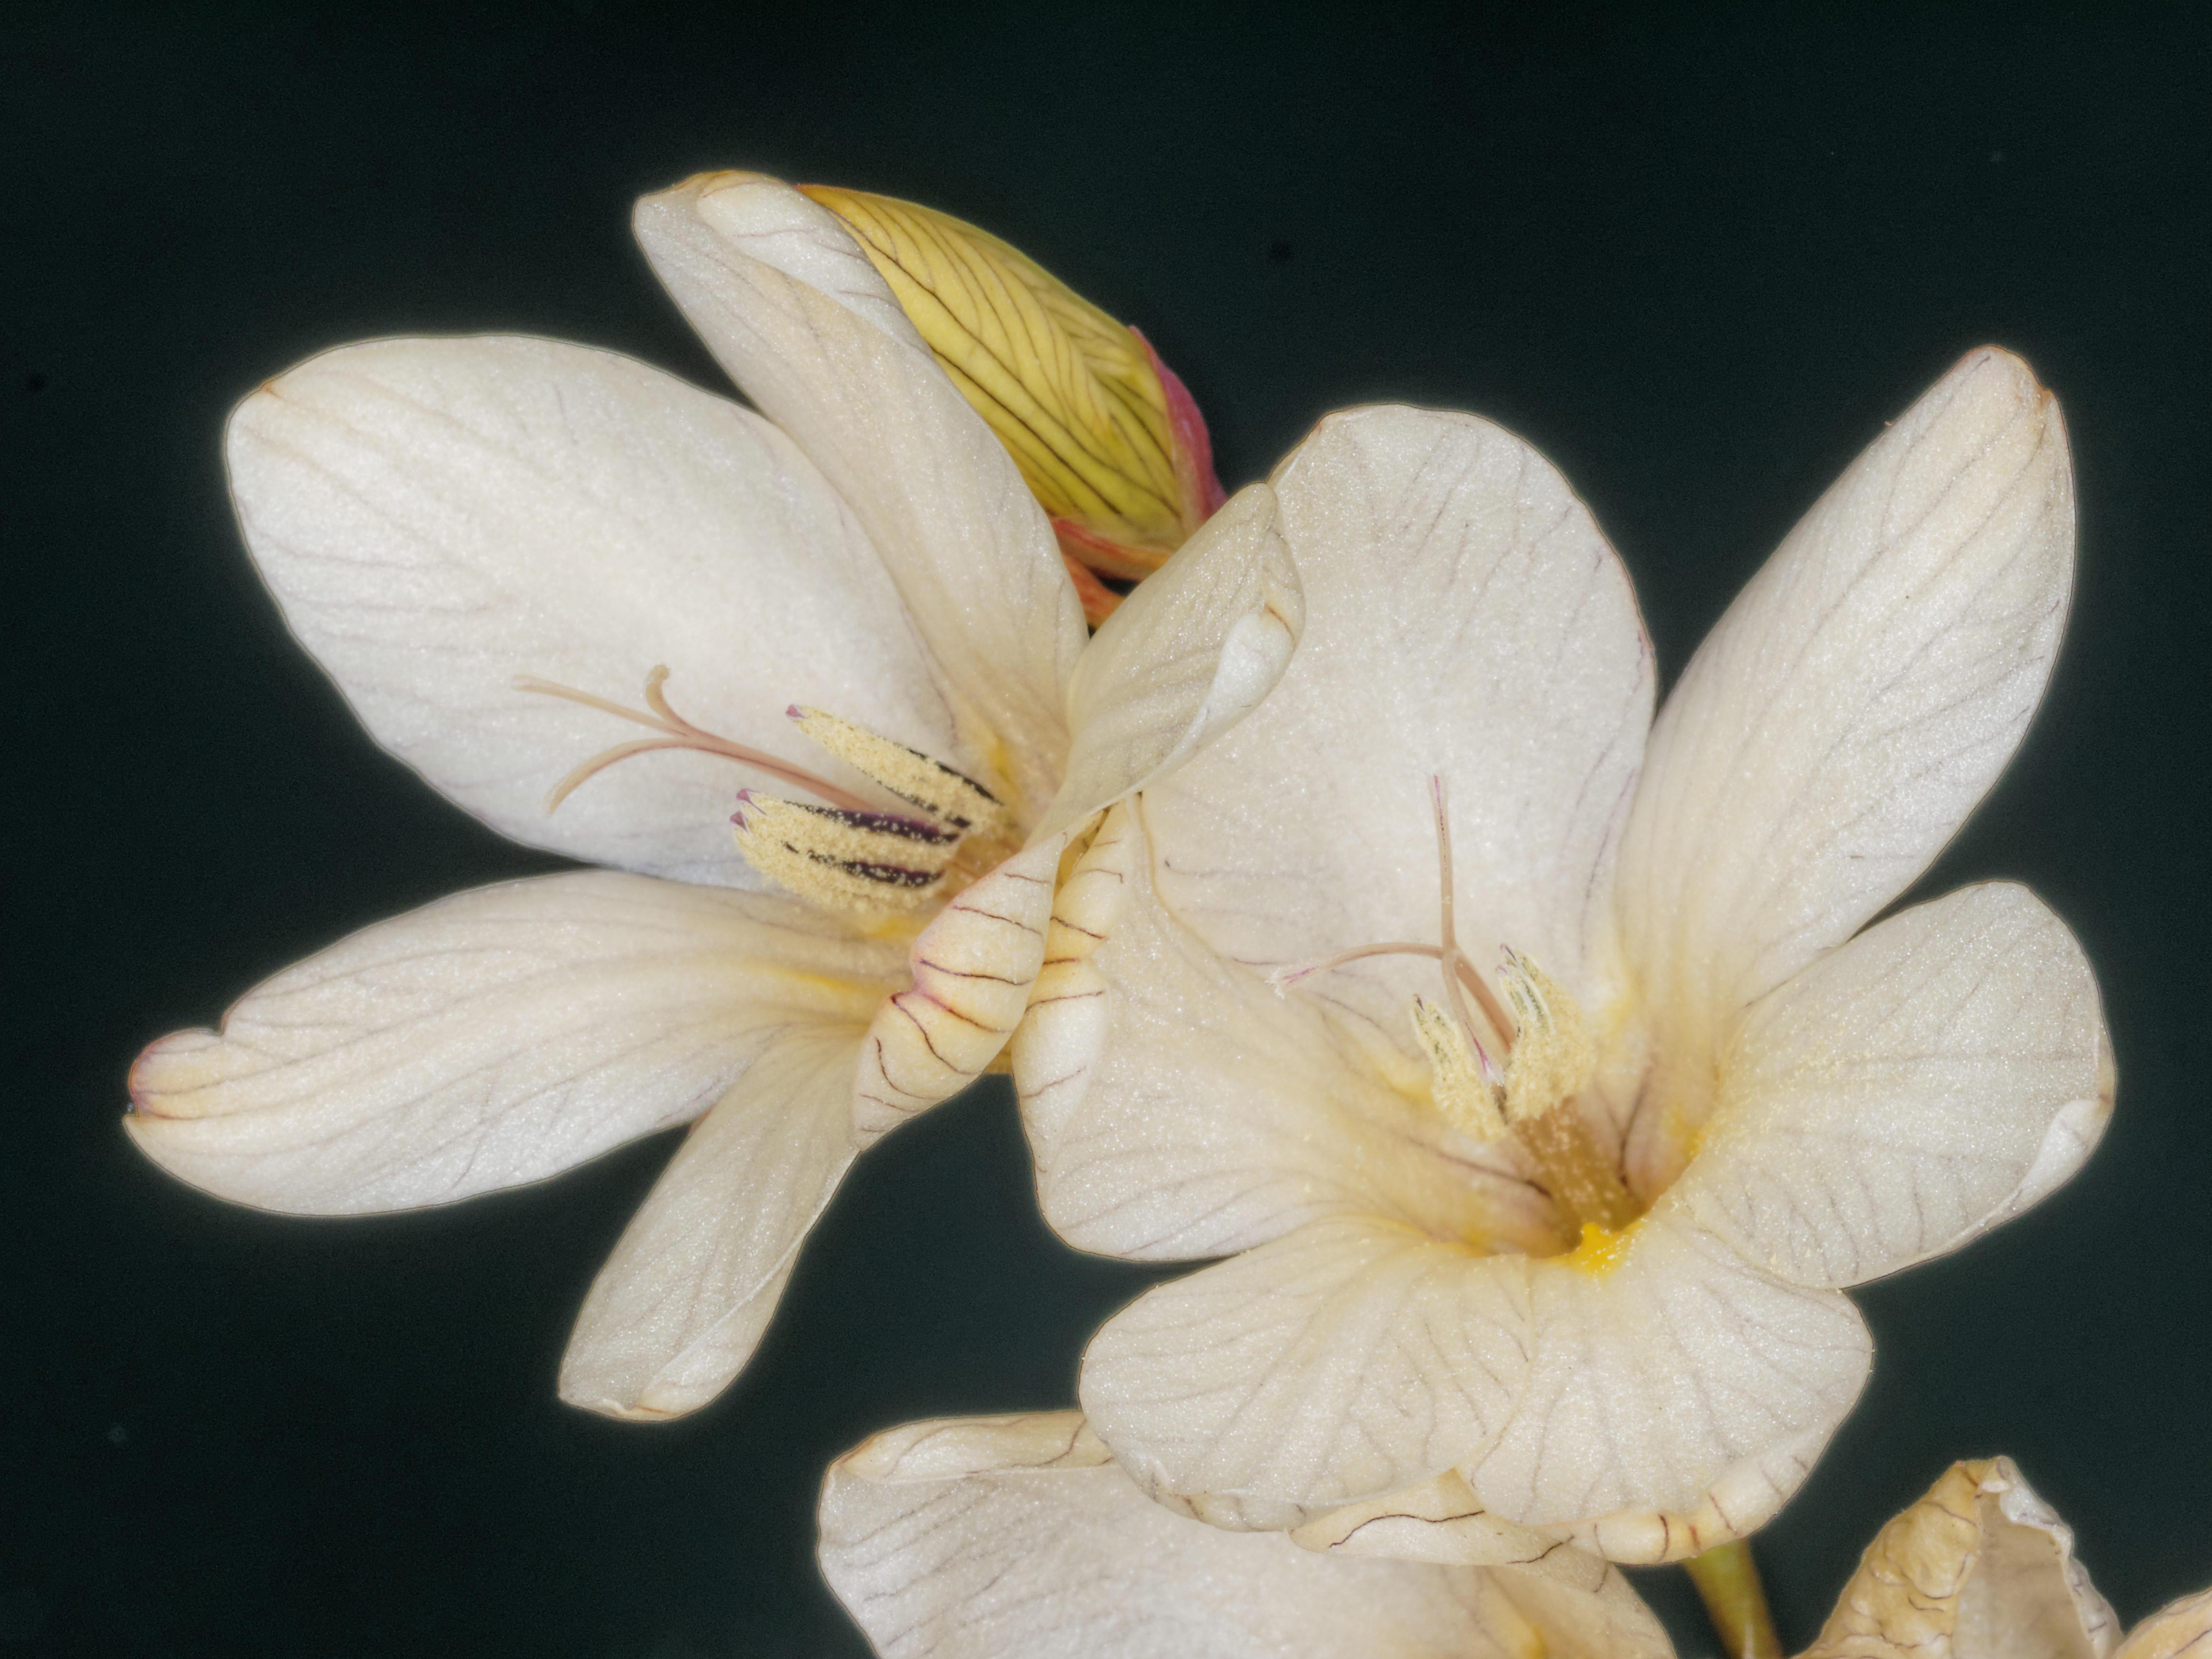 Mystery-flower-9.jpeg